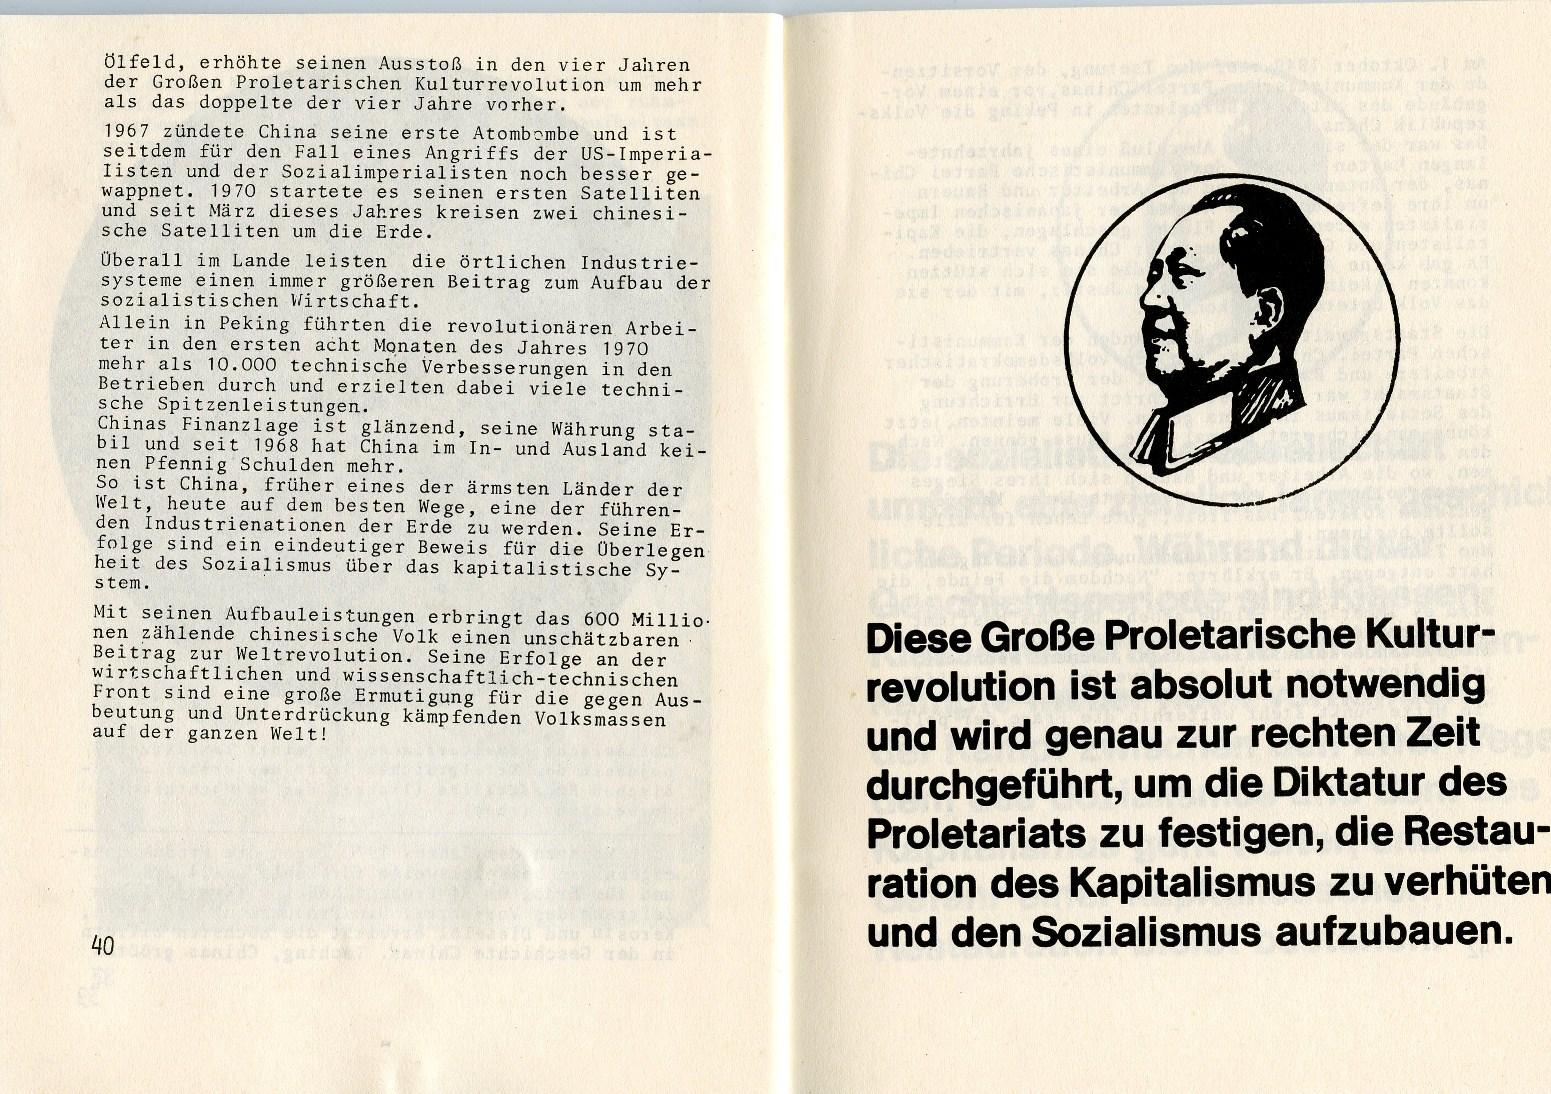 ZB_KPChinas_1971_22